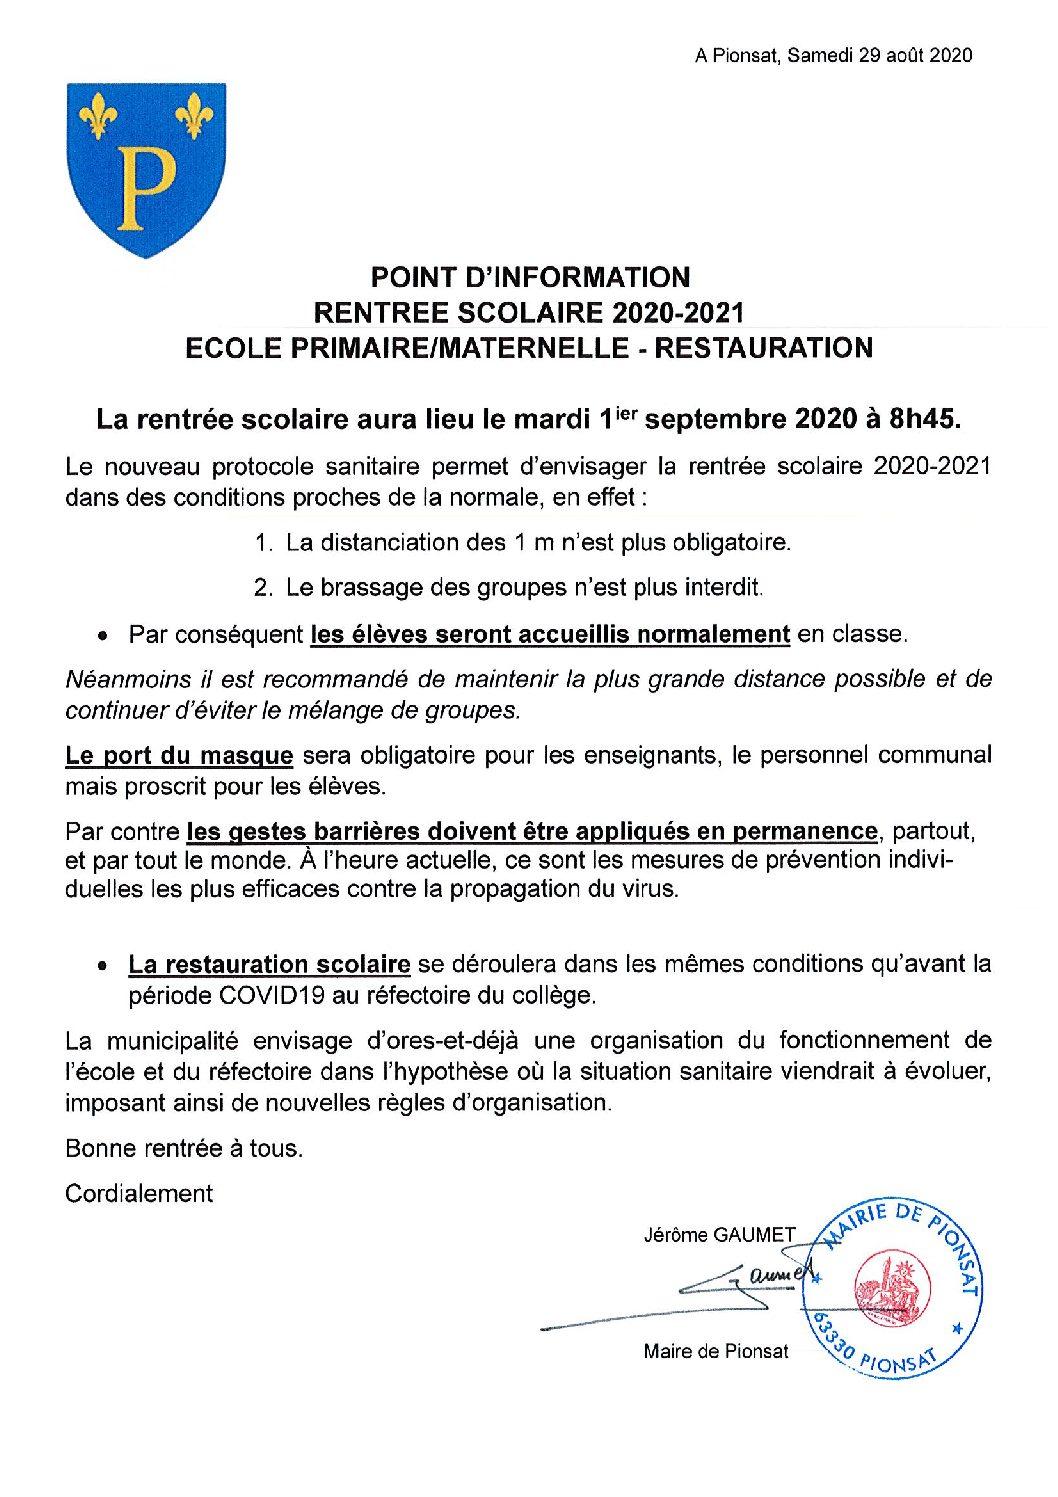 POINT INFORMATION                   RENTREE SCOLAIRE 2020-2021  ECOLE PRIMAIRE/MATERNELLE RESTAURATION